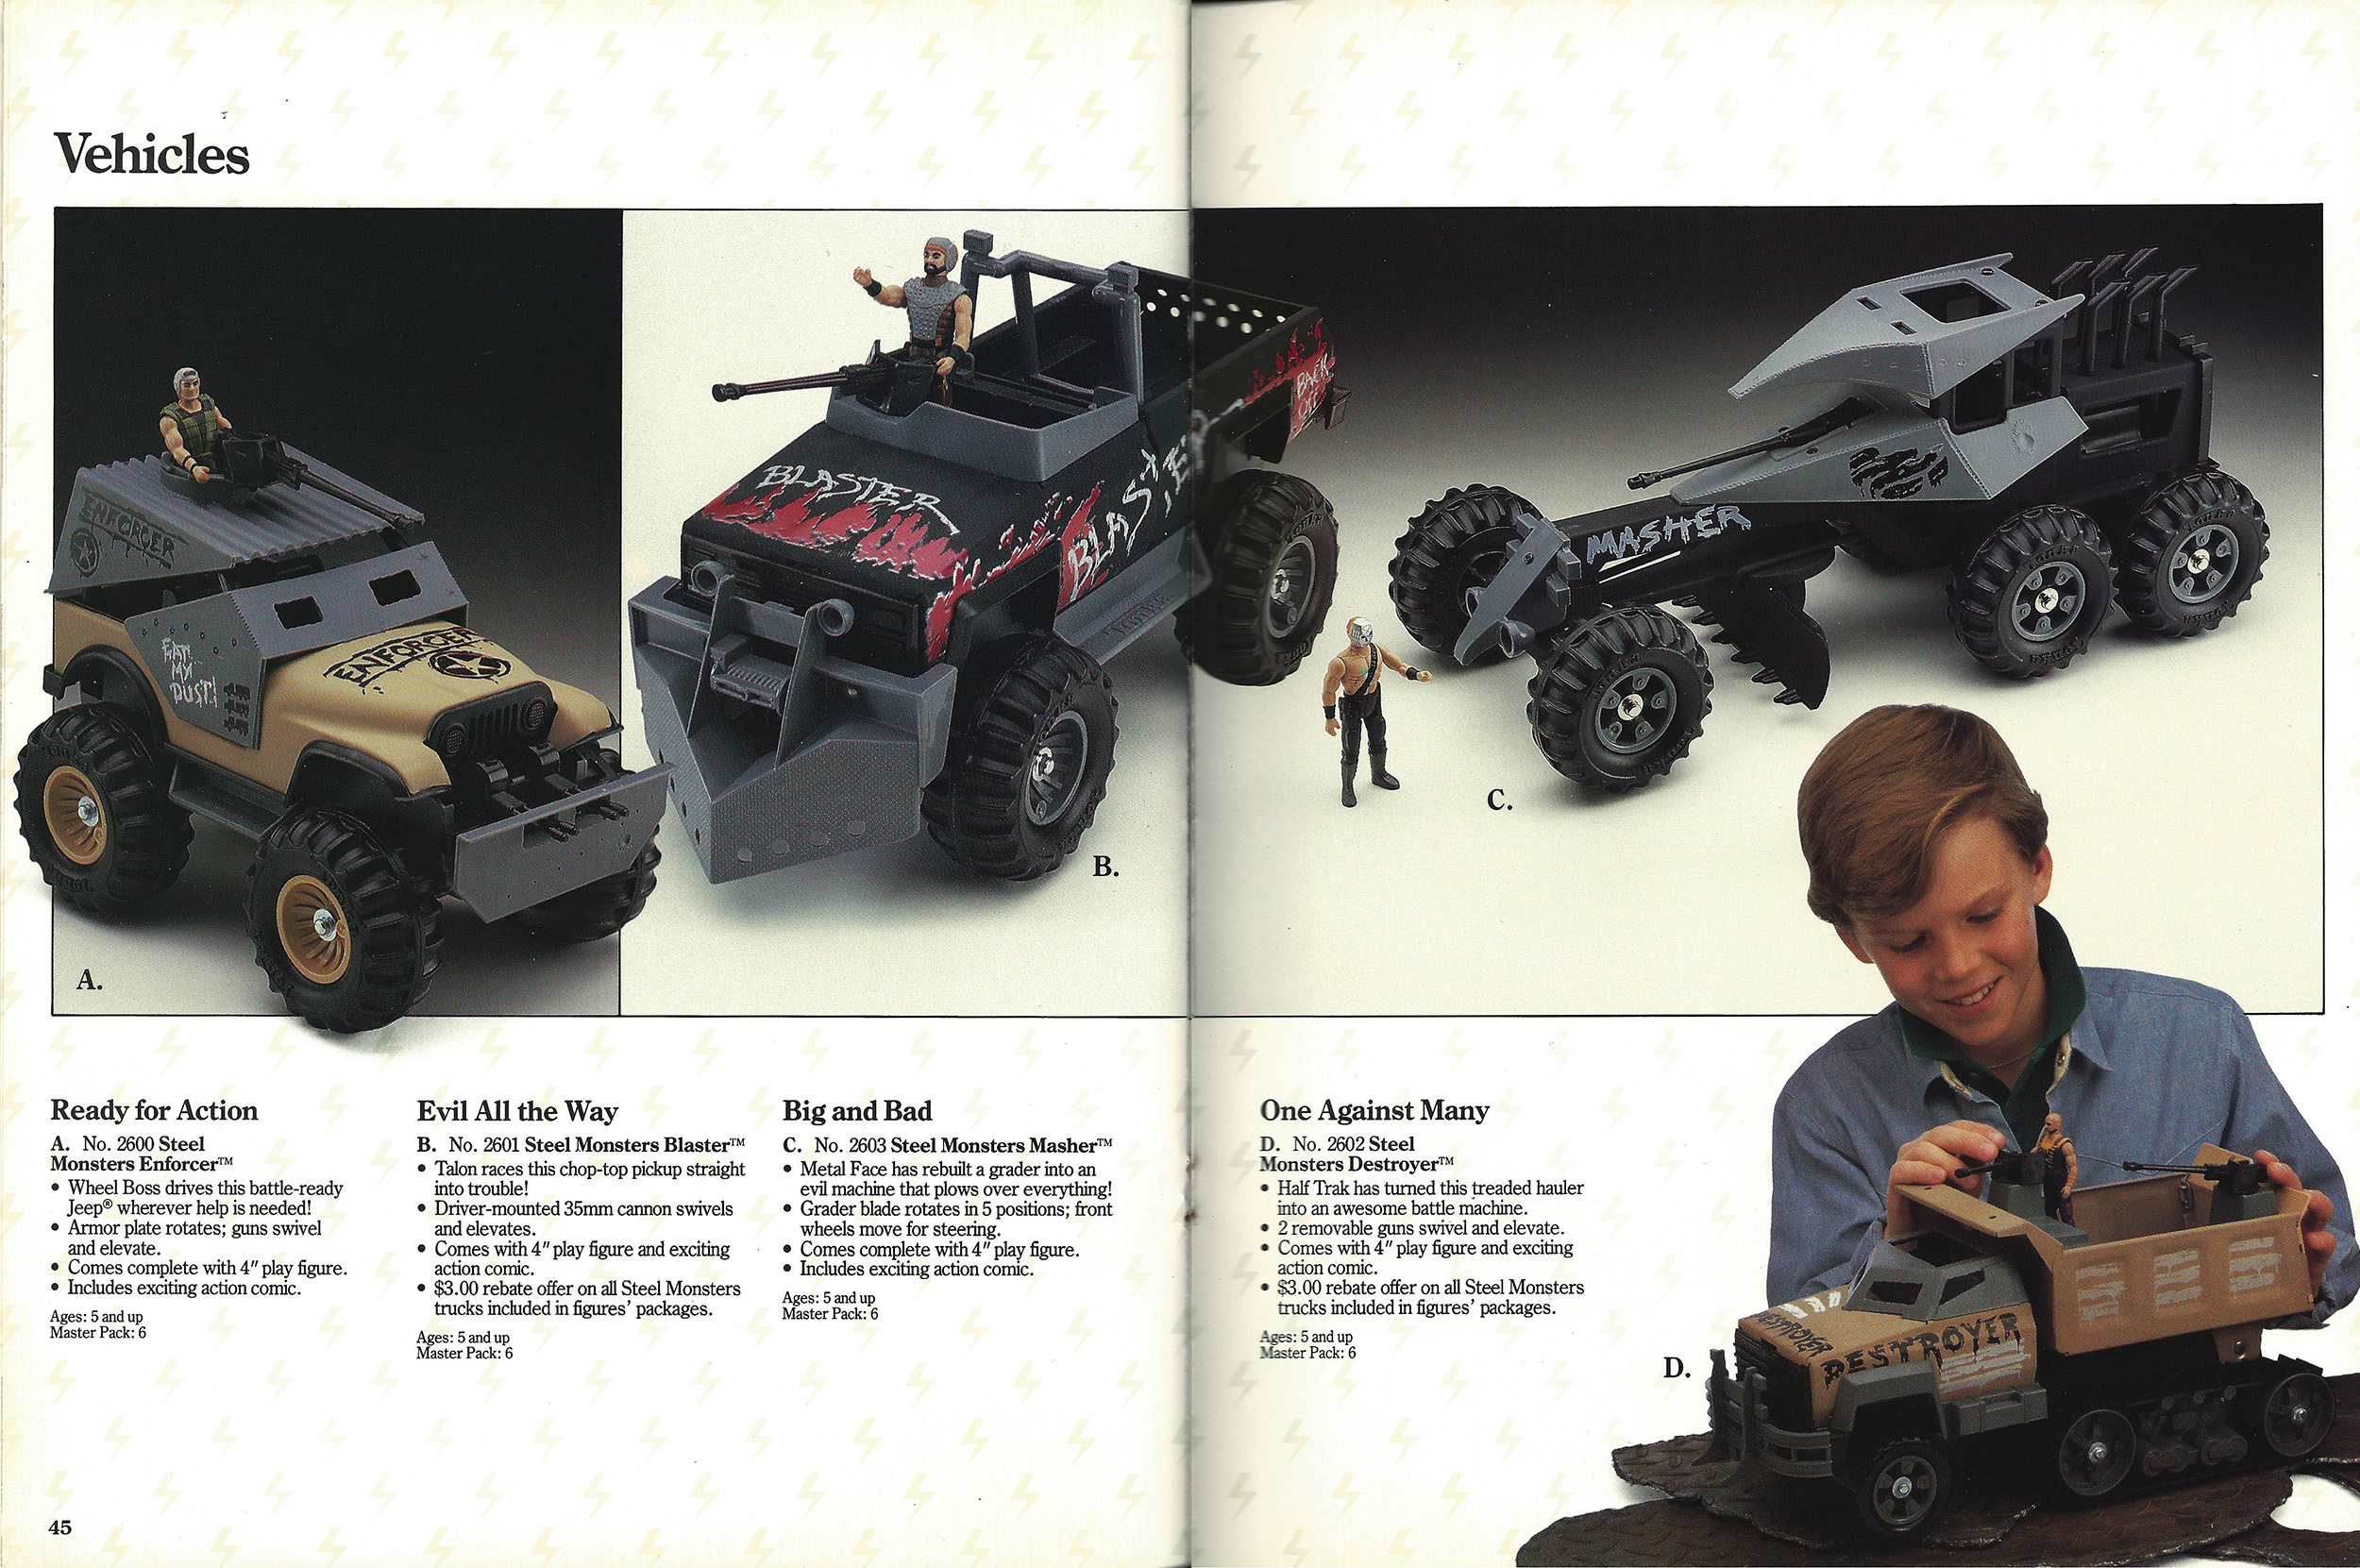 Tonka Dealer Catalog, 1987. Source:  battlegrip.com